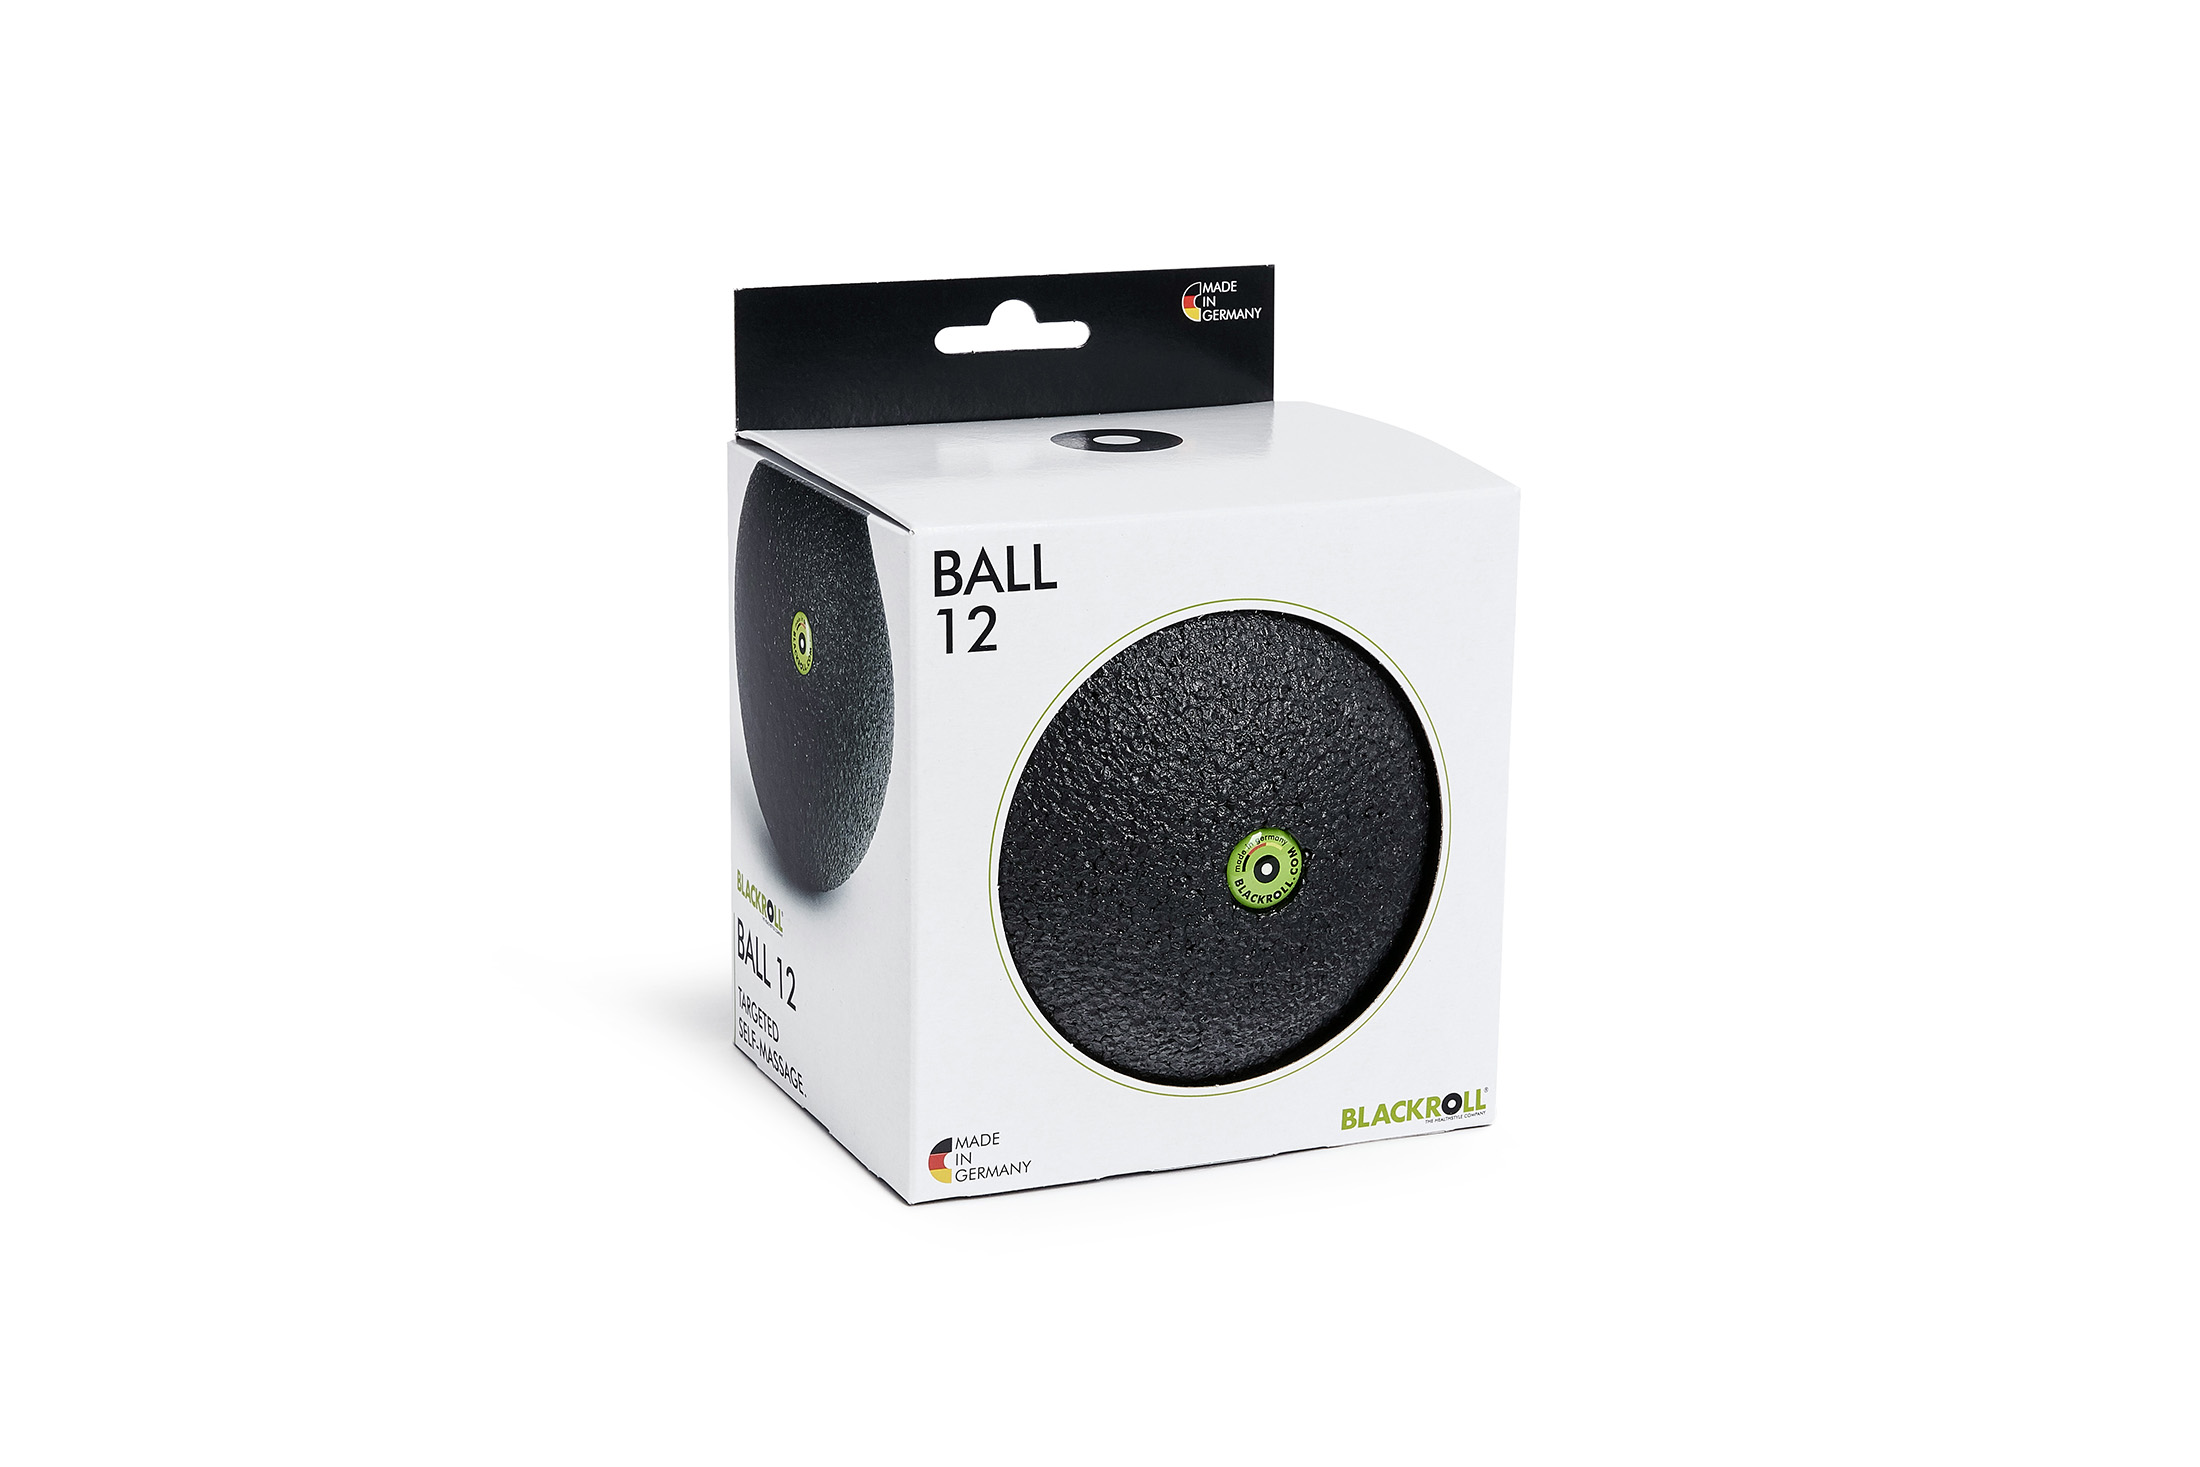 BLACKROLL® BALL 12 black - boxed incl. doming